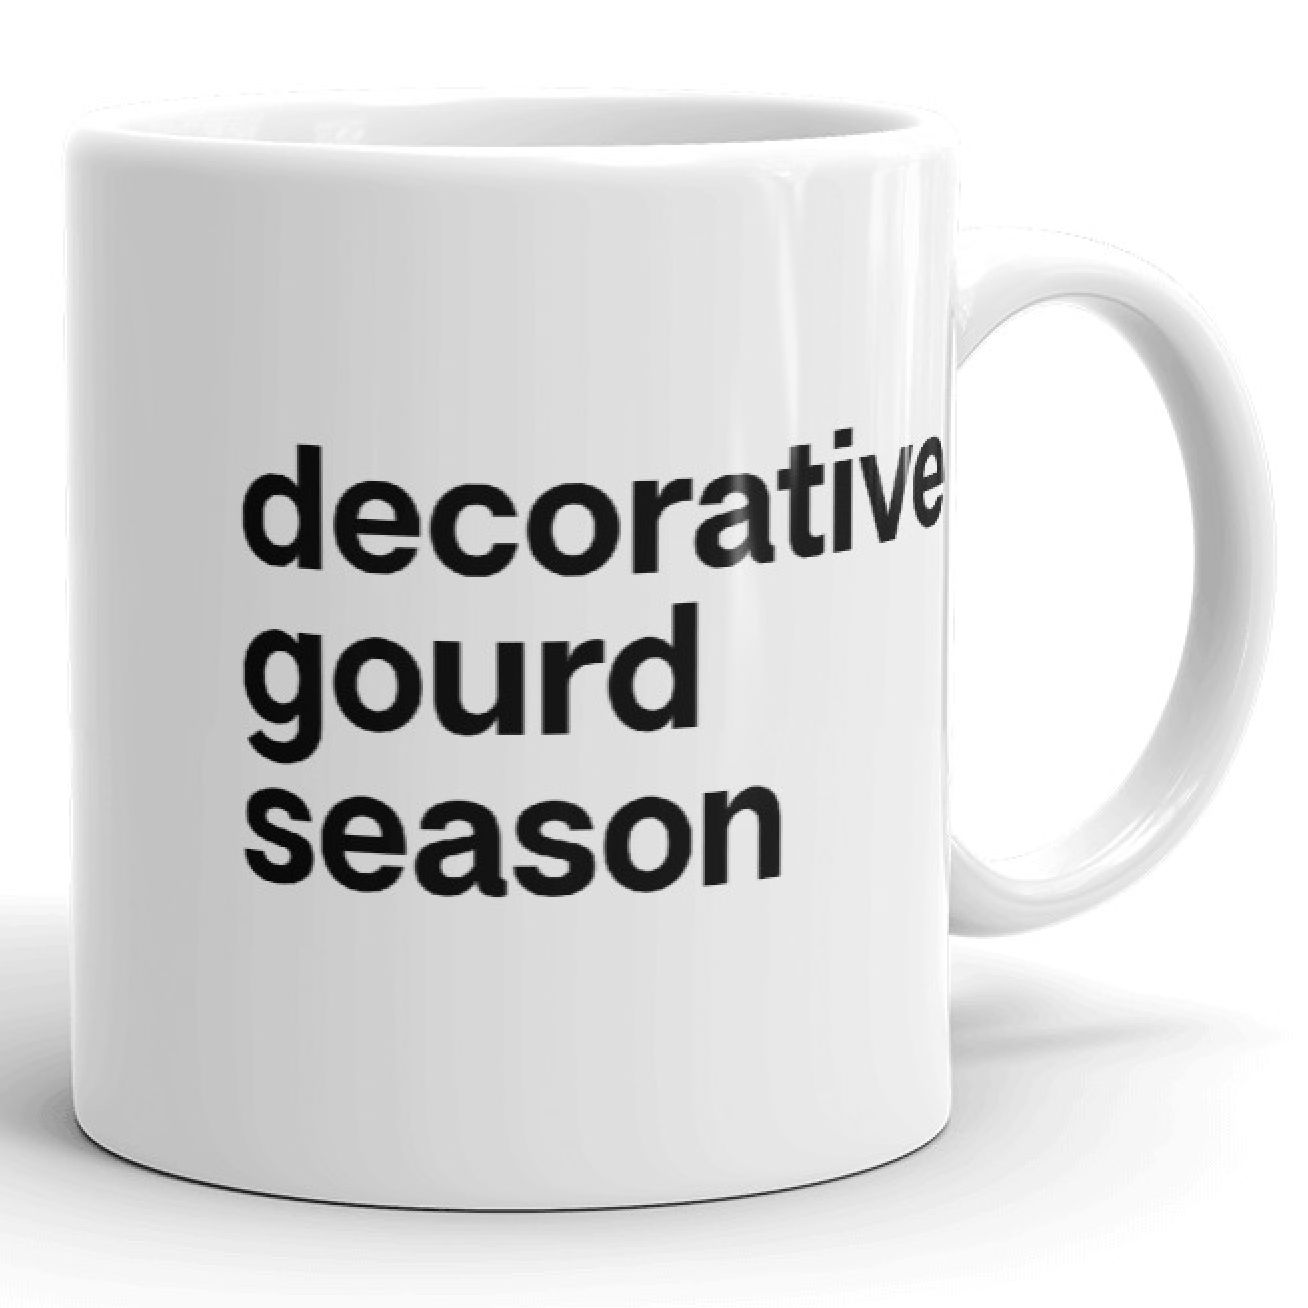 cobberson decorative gourd season mug